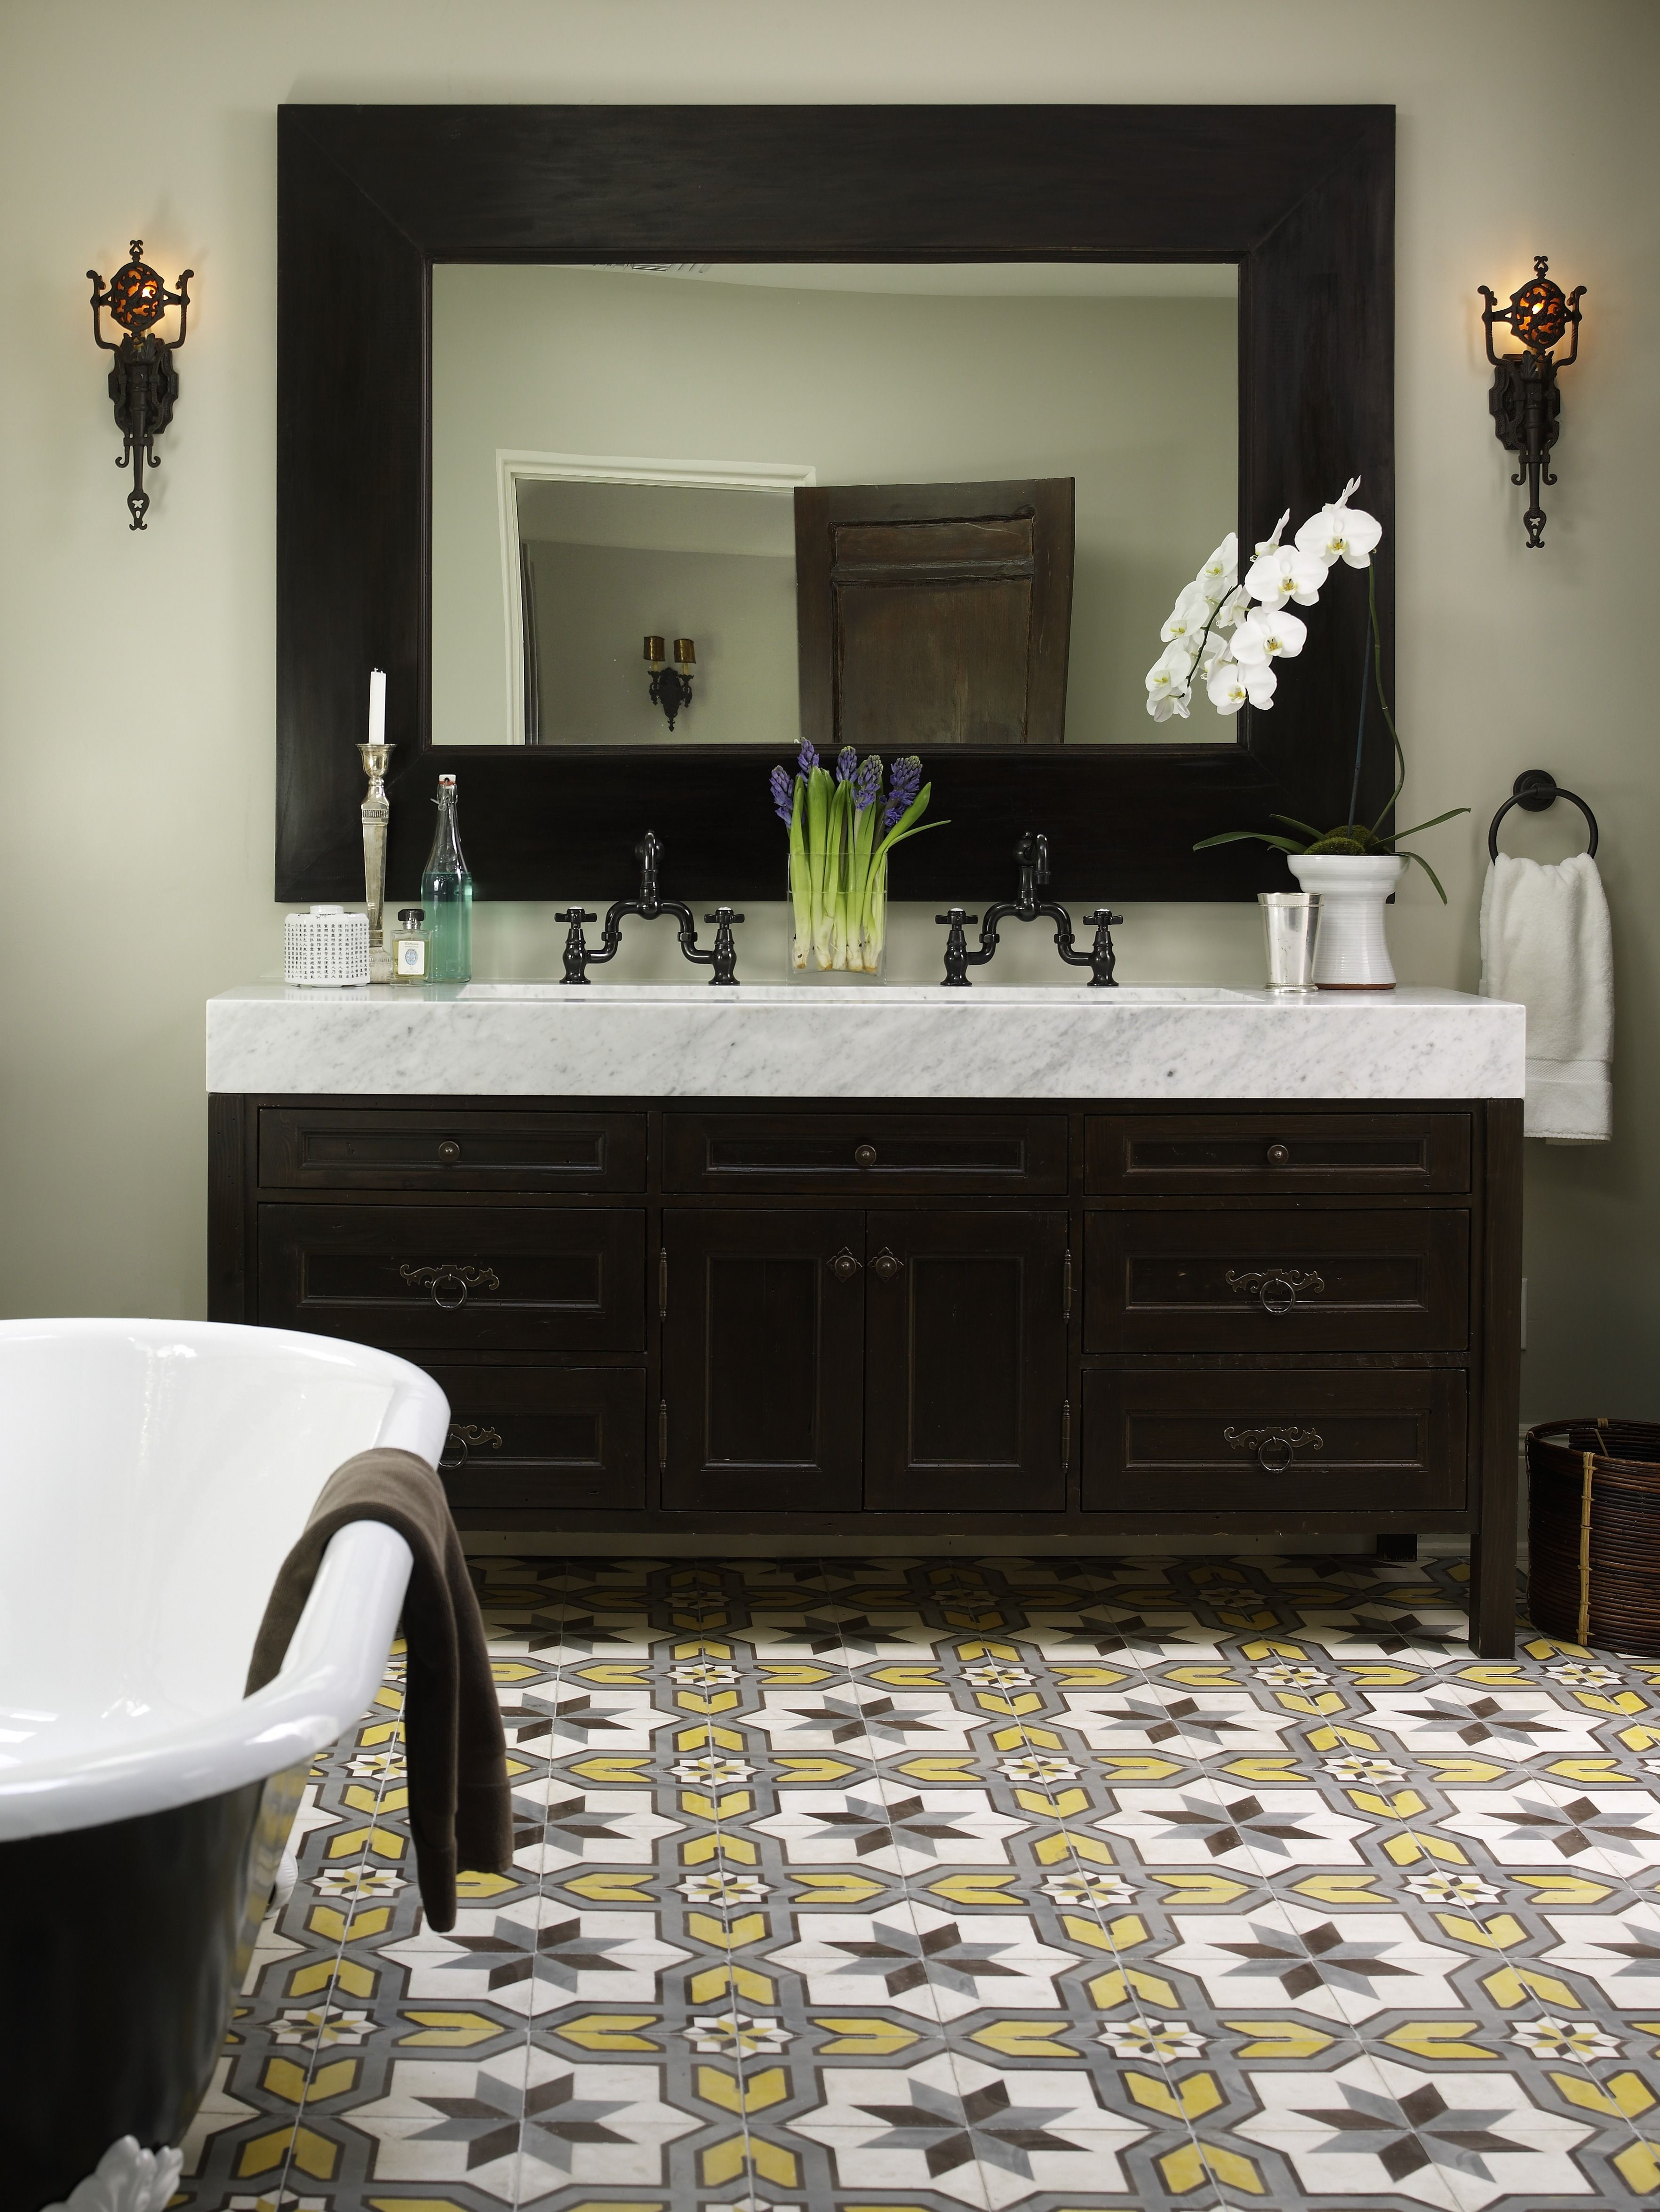 33 Bathroom Tile Design Ideas Tiles For Floor Showers And Walls